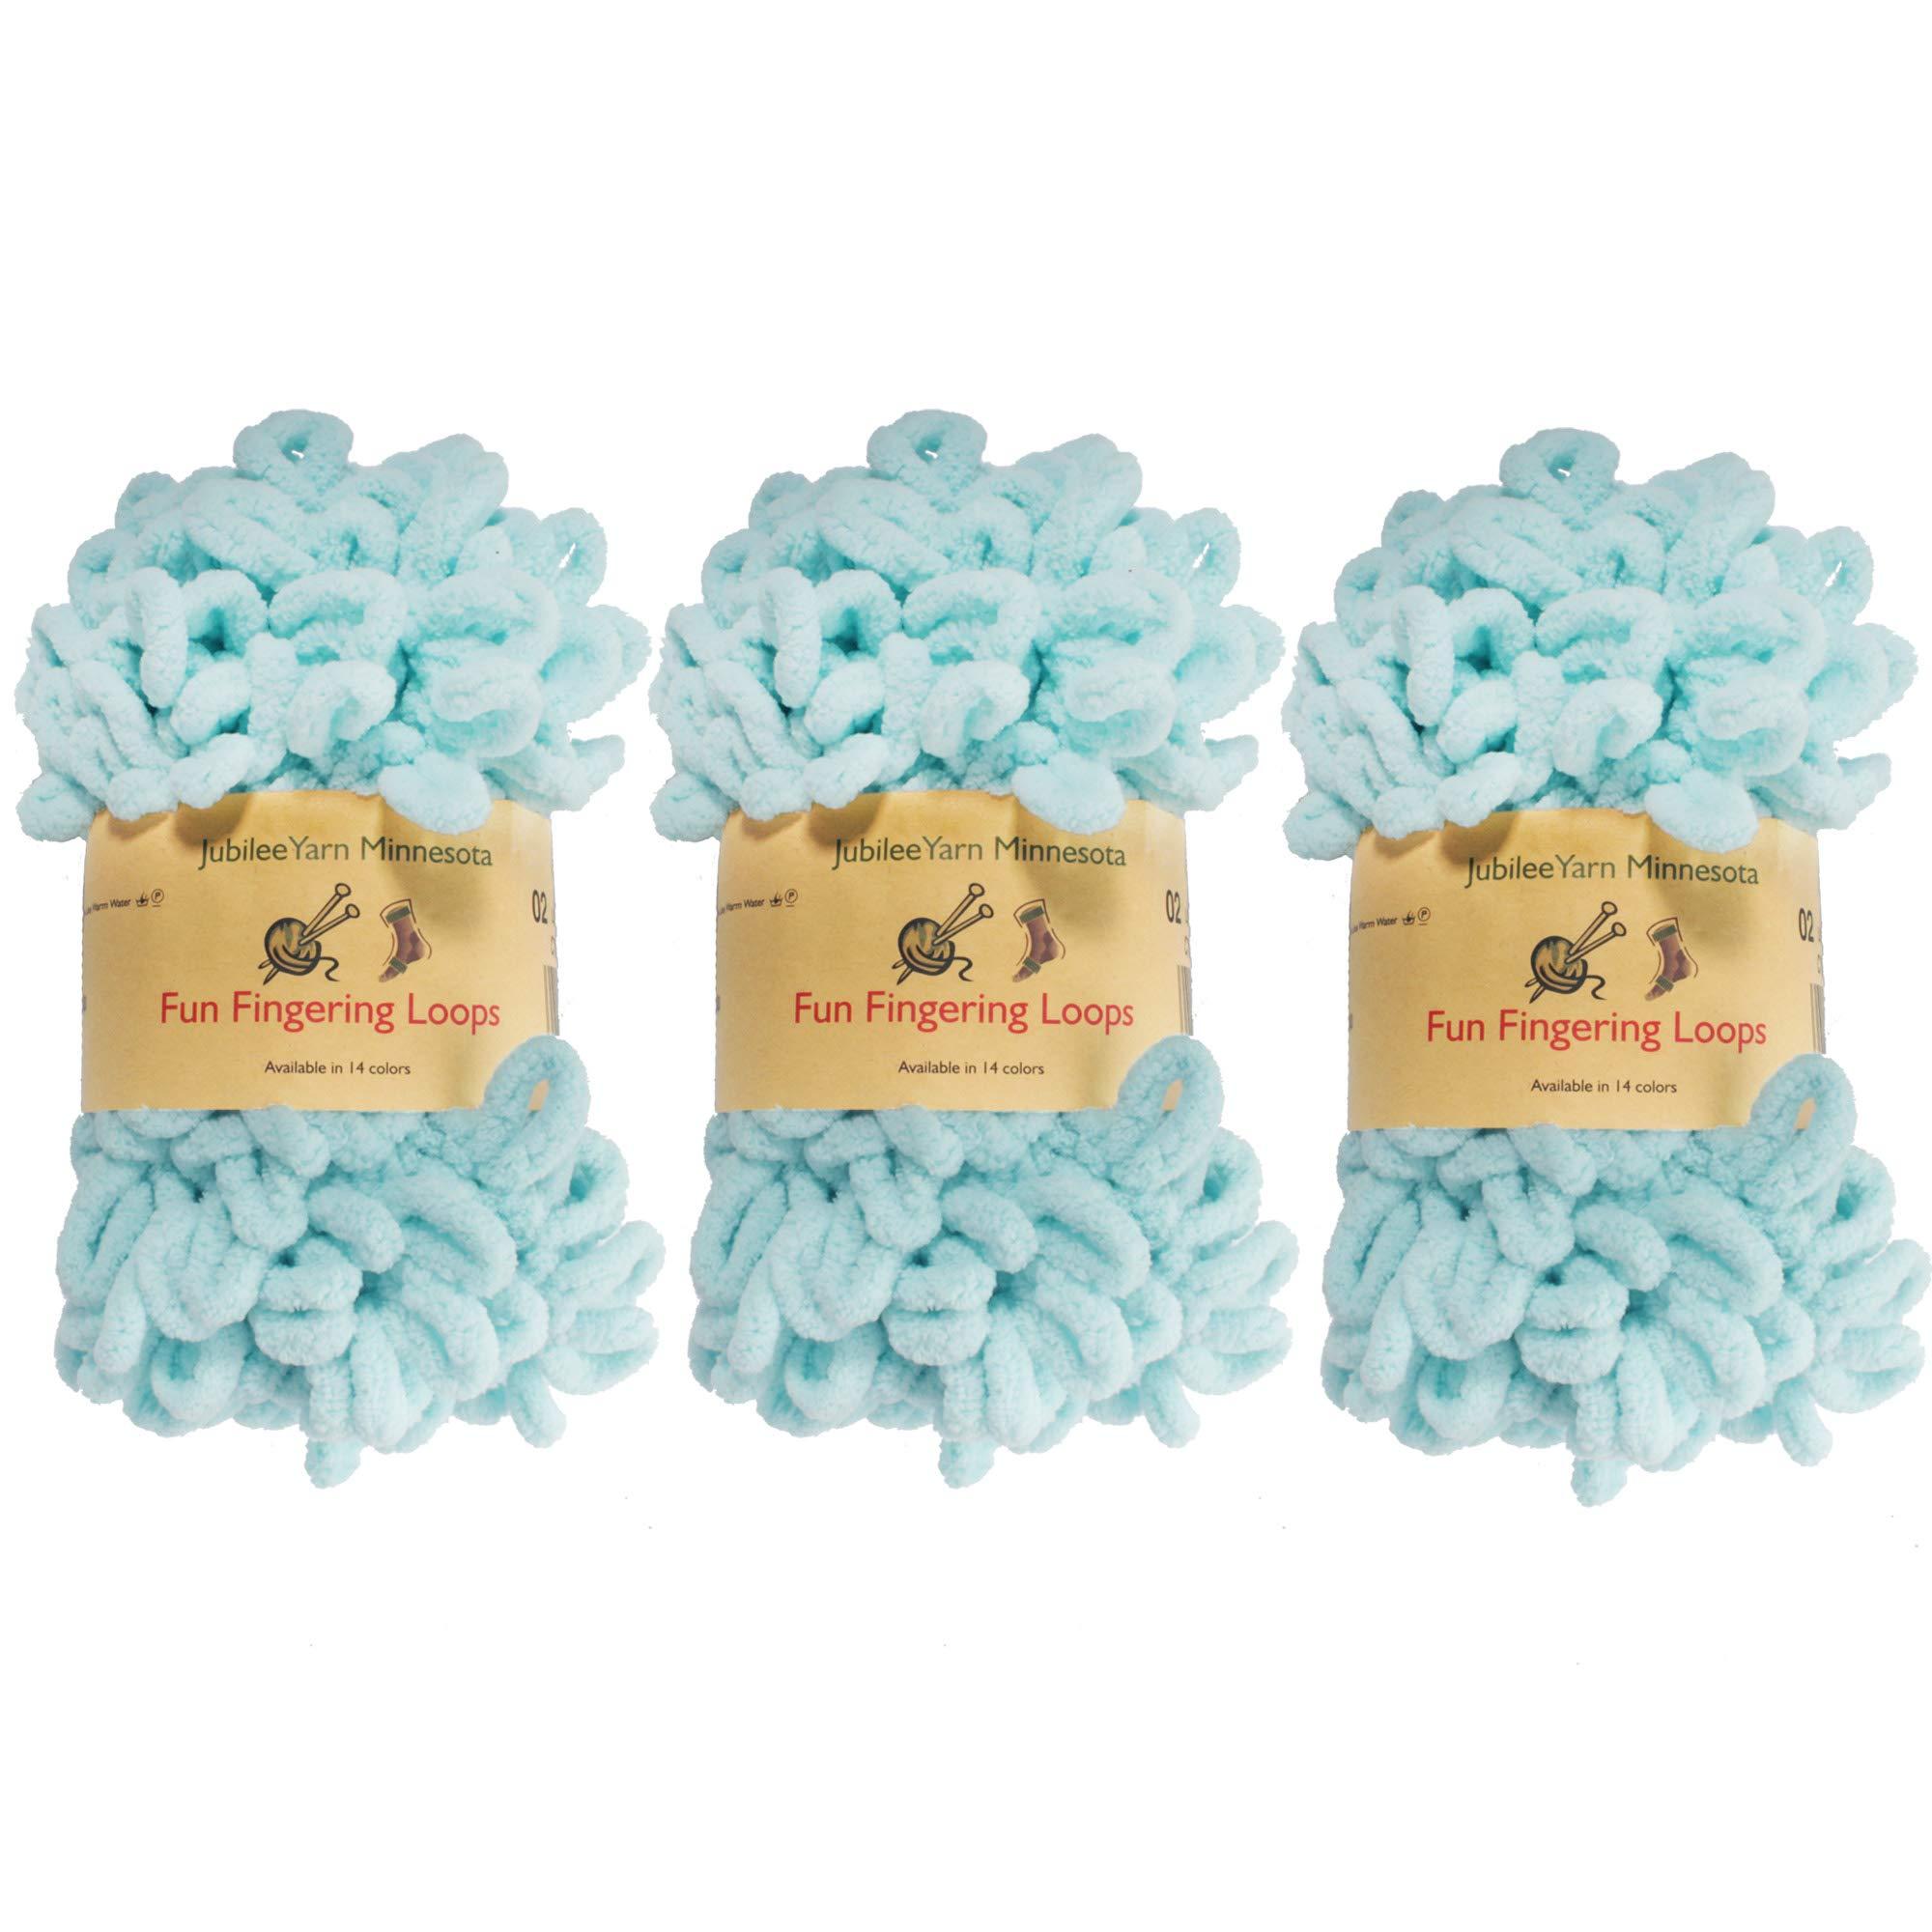 BambooMN Finger Knitting Yarn - Fun Finger Loops Yarn - 100% Polyester - Blue - 3 Skeins